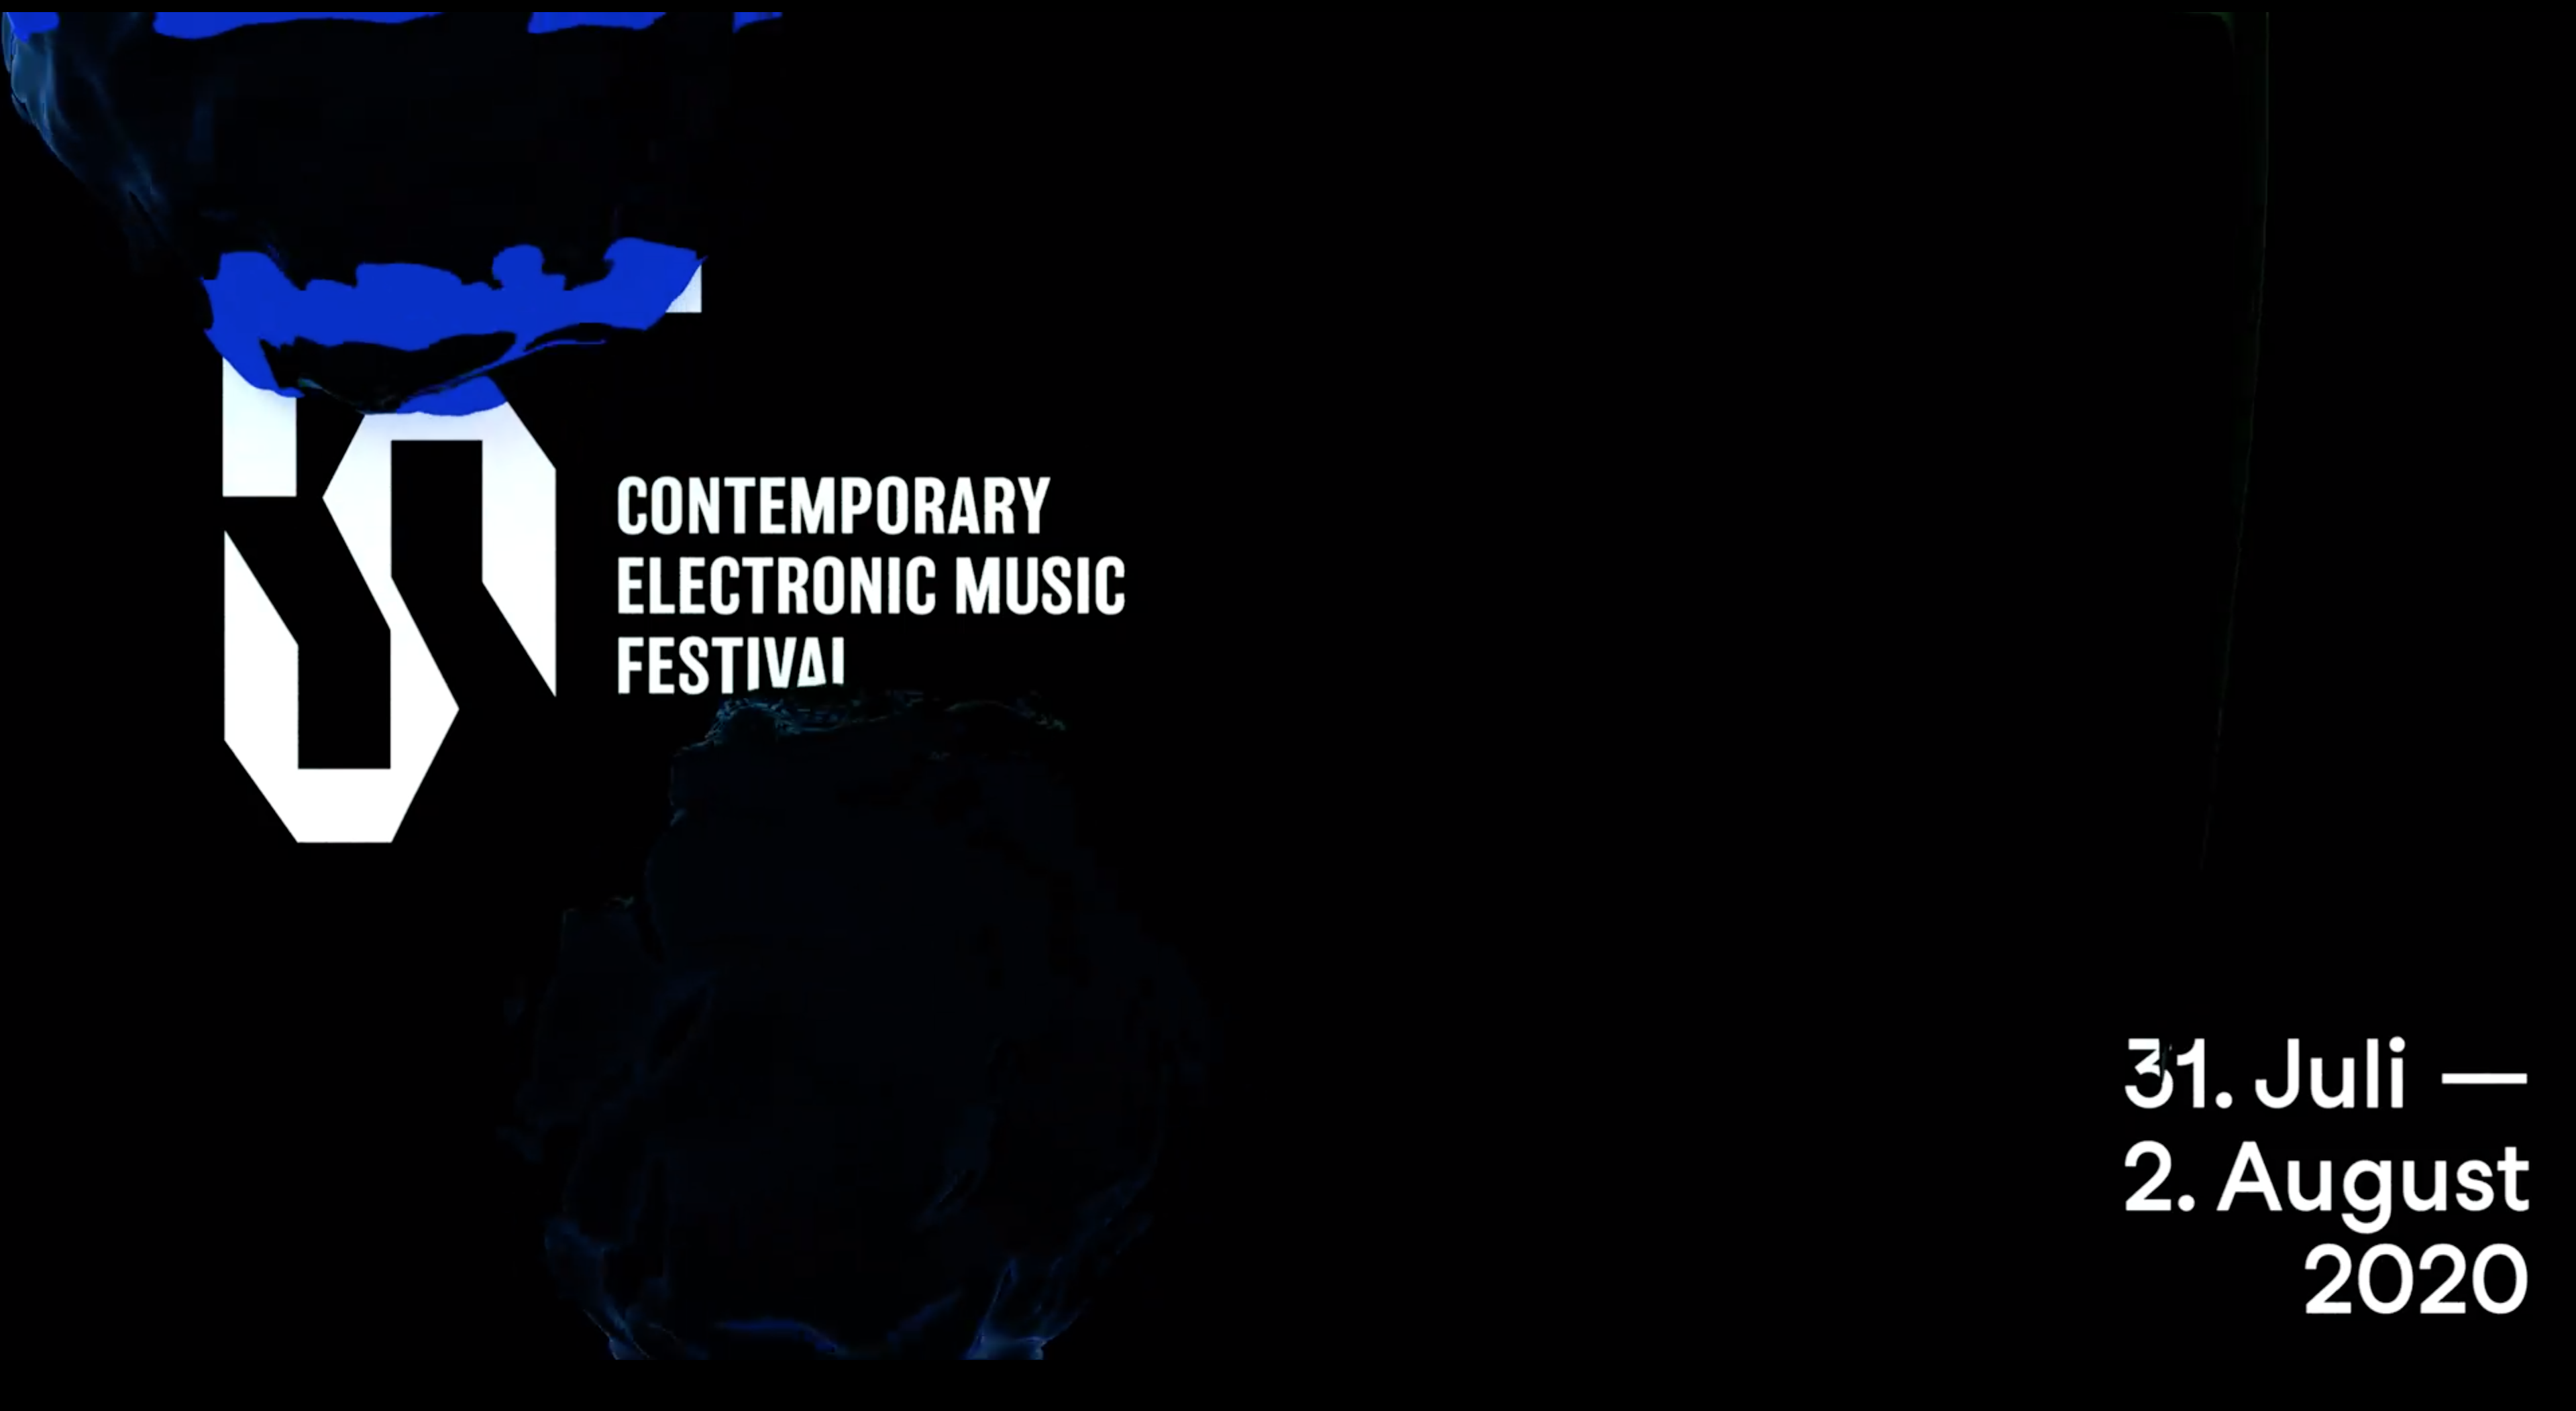 Lost Social Festival 2020 am 31. July 2020 @ Pratersauna.